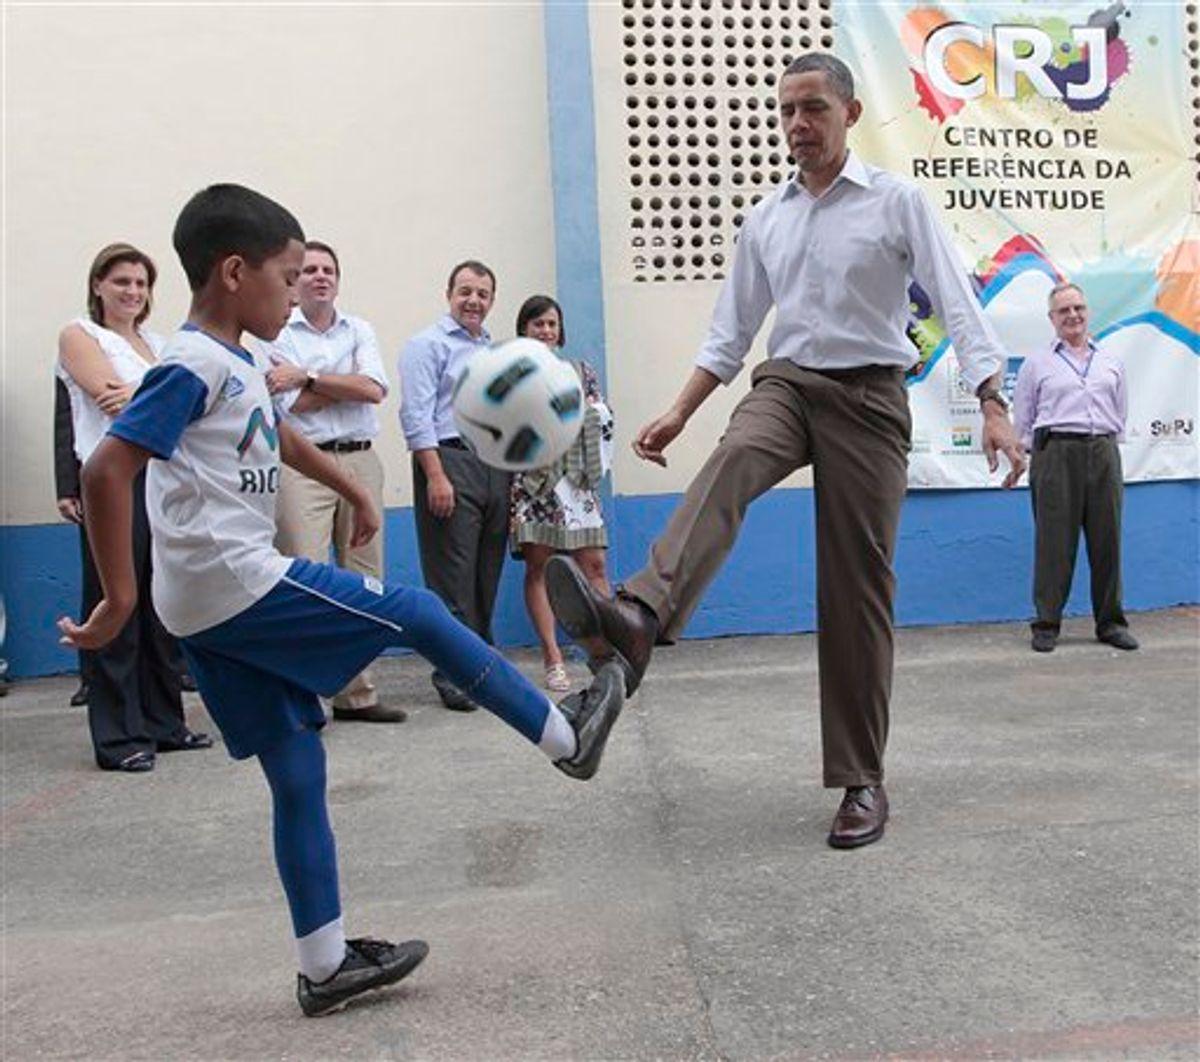 U.S. President Barack Obama practices his soccer dribbling abilities as he plays with local children during his tour of the Ciudad de Deus Favela in Rio de Janeiro, Brazil, Sunday, March 20, 2011. (AP Photo/Pablo Martinez Monsivais) (AP)